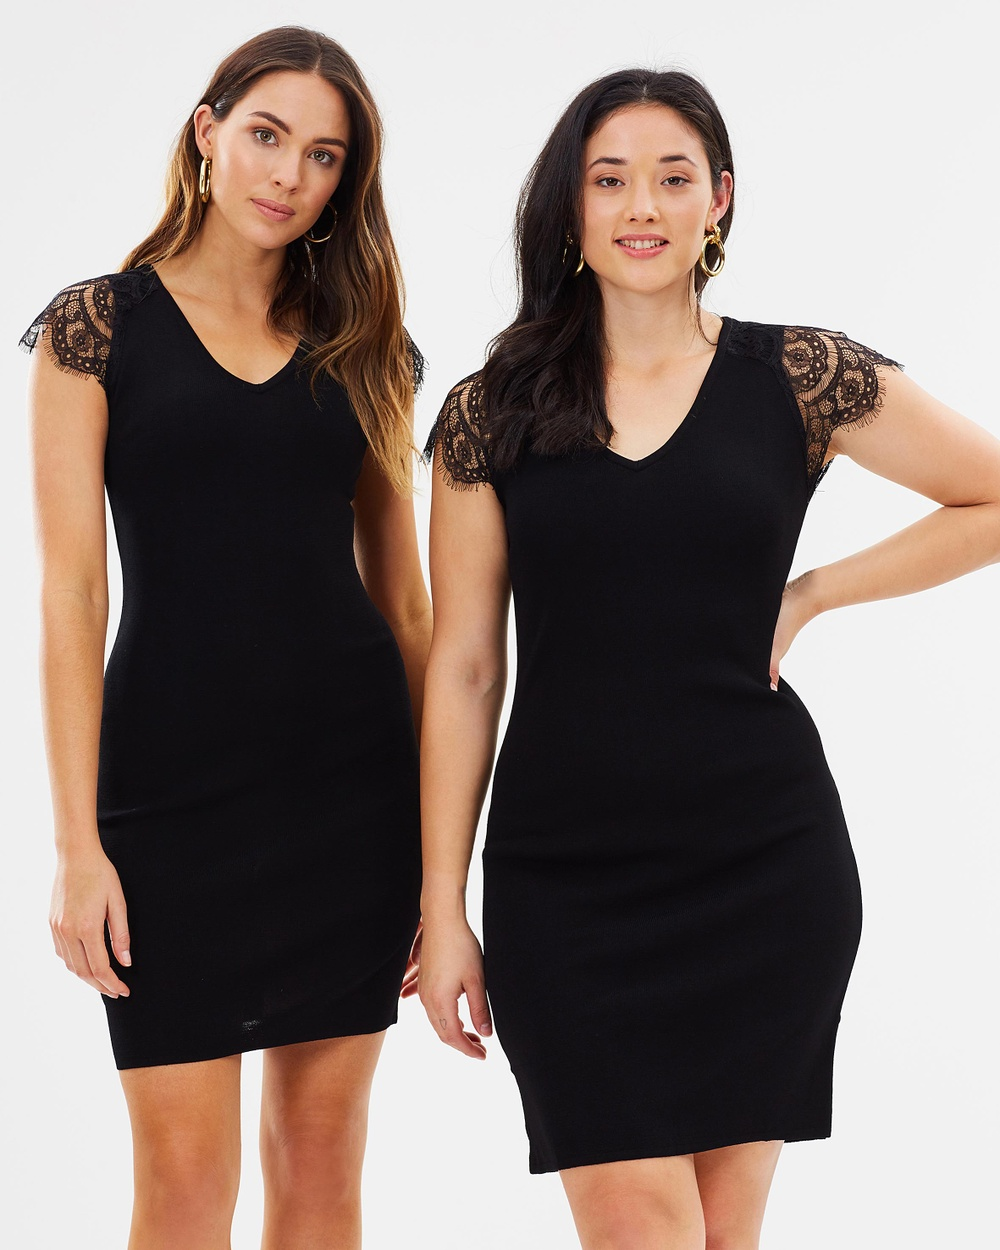 M.N.G Event Dress Bodycon Dresses Black Event Dress